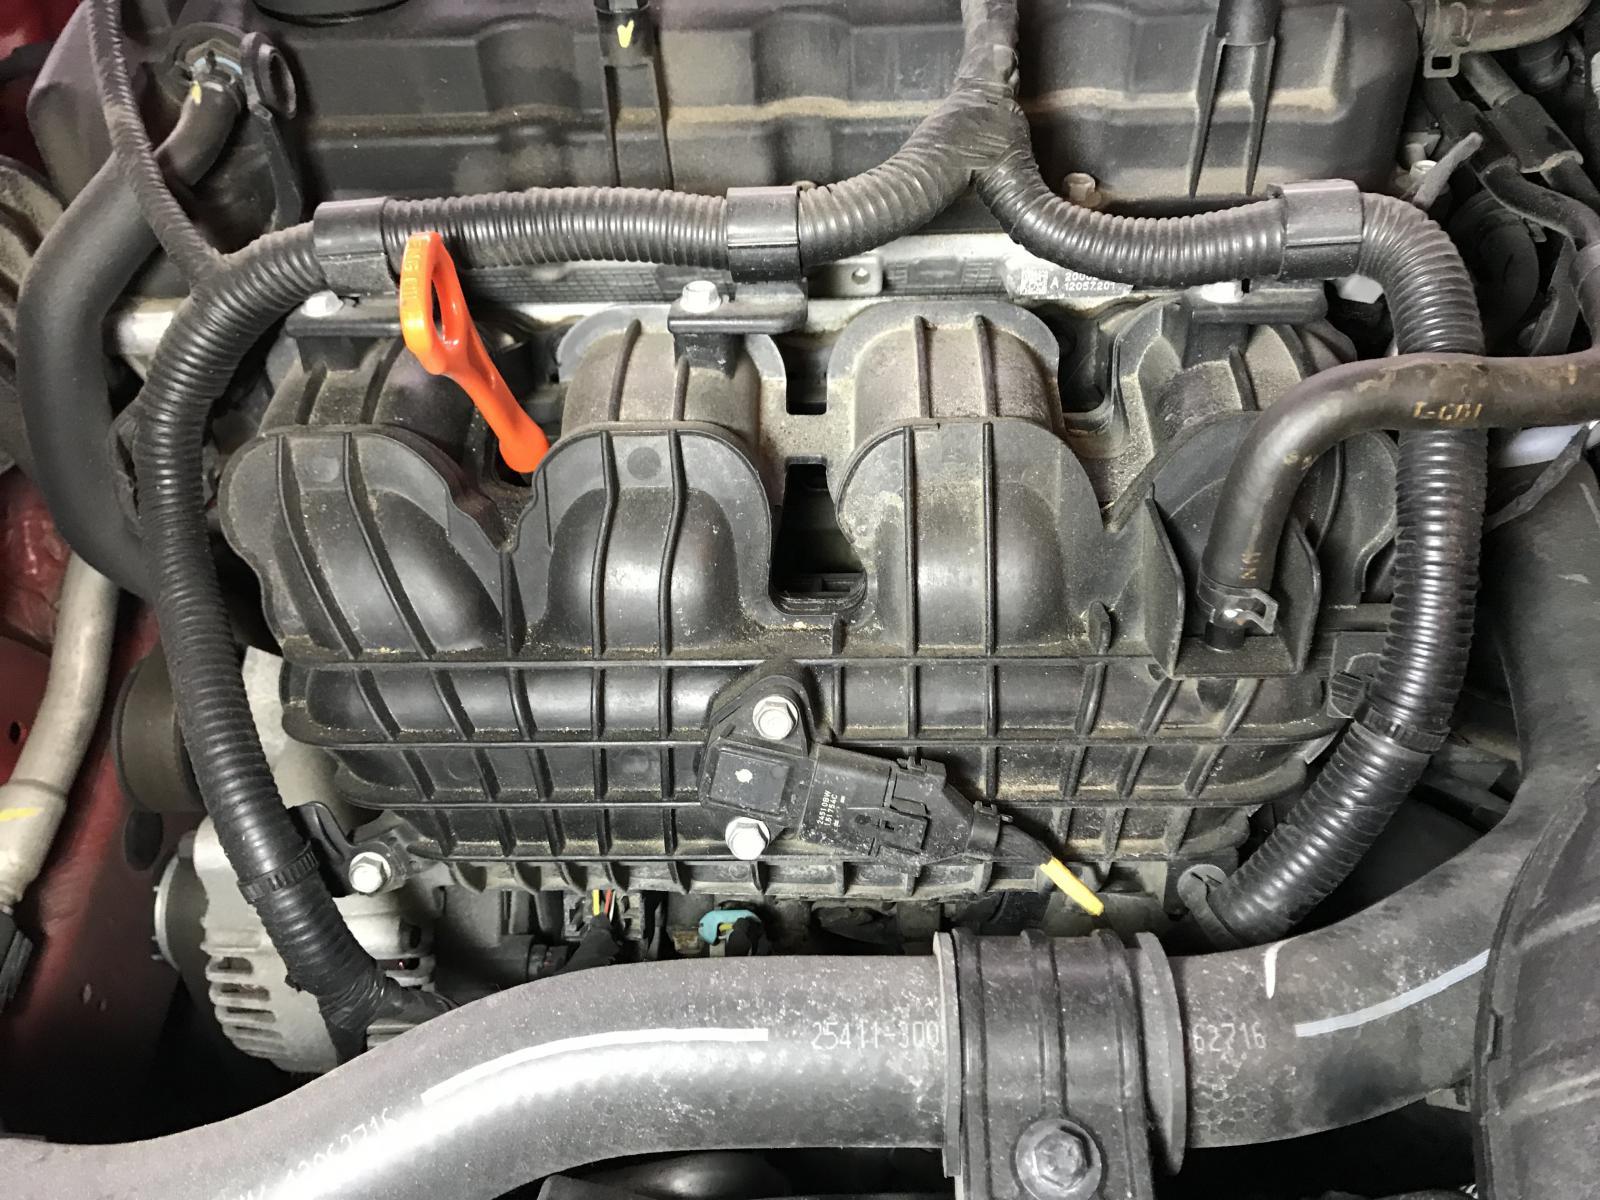 2013 optima sx turbo maintenance question-img_0963 jpg